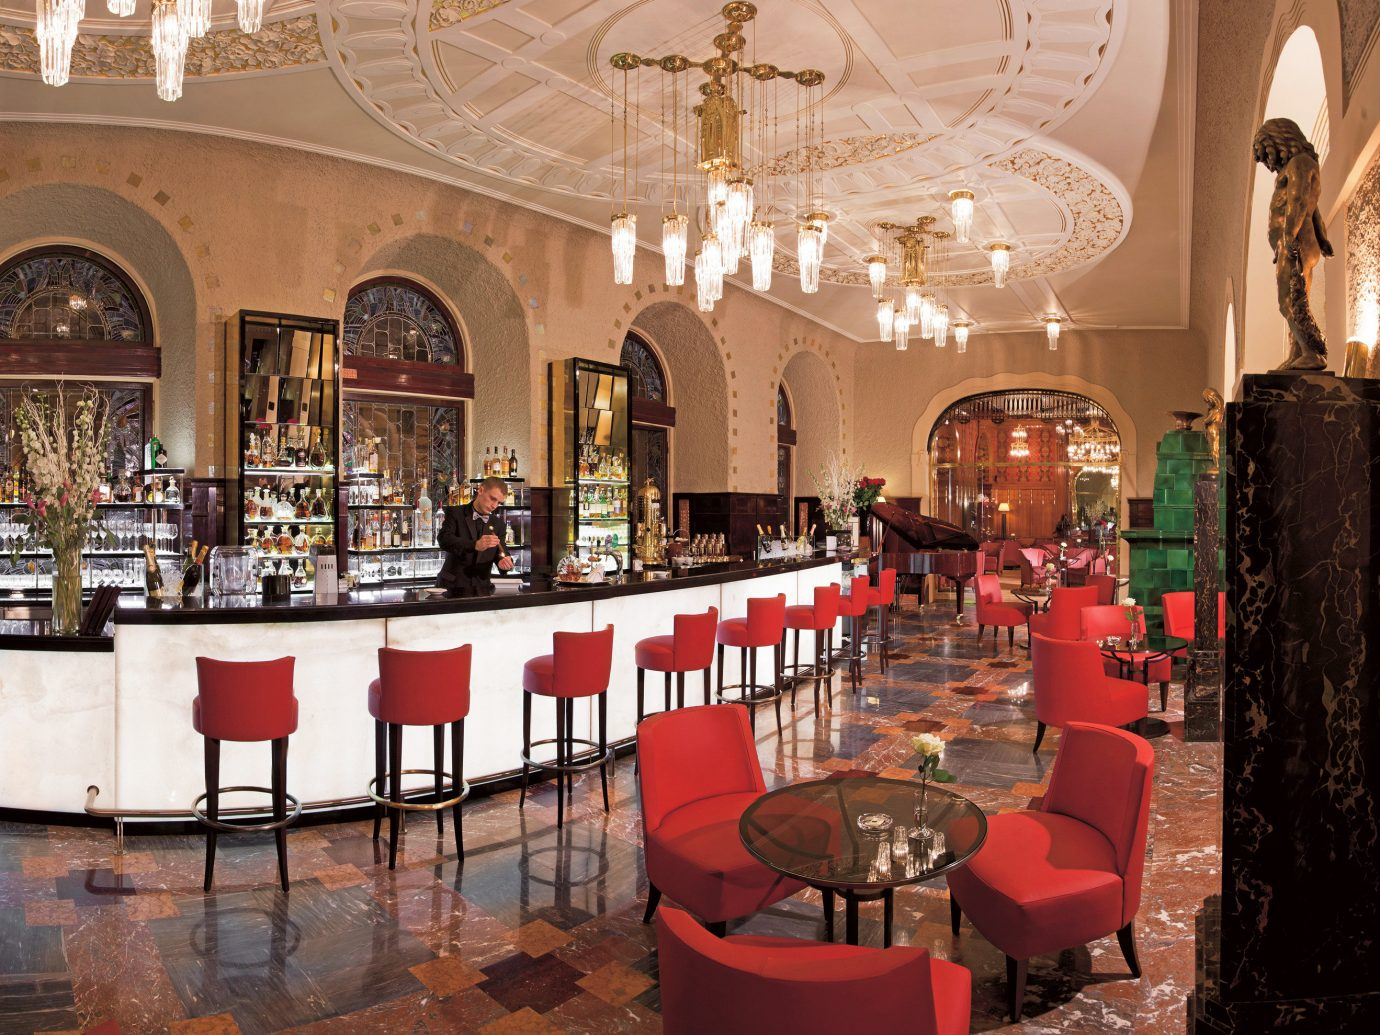 Bar Drink Eat Elegant Hotels Luxury Luxury Travel indoor wall floor red room restaurant interior design function hall meal several dining room